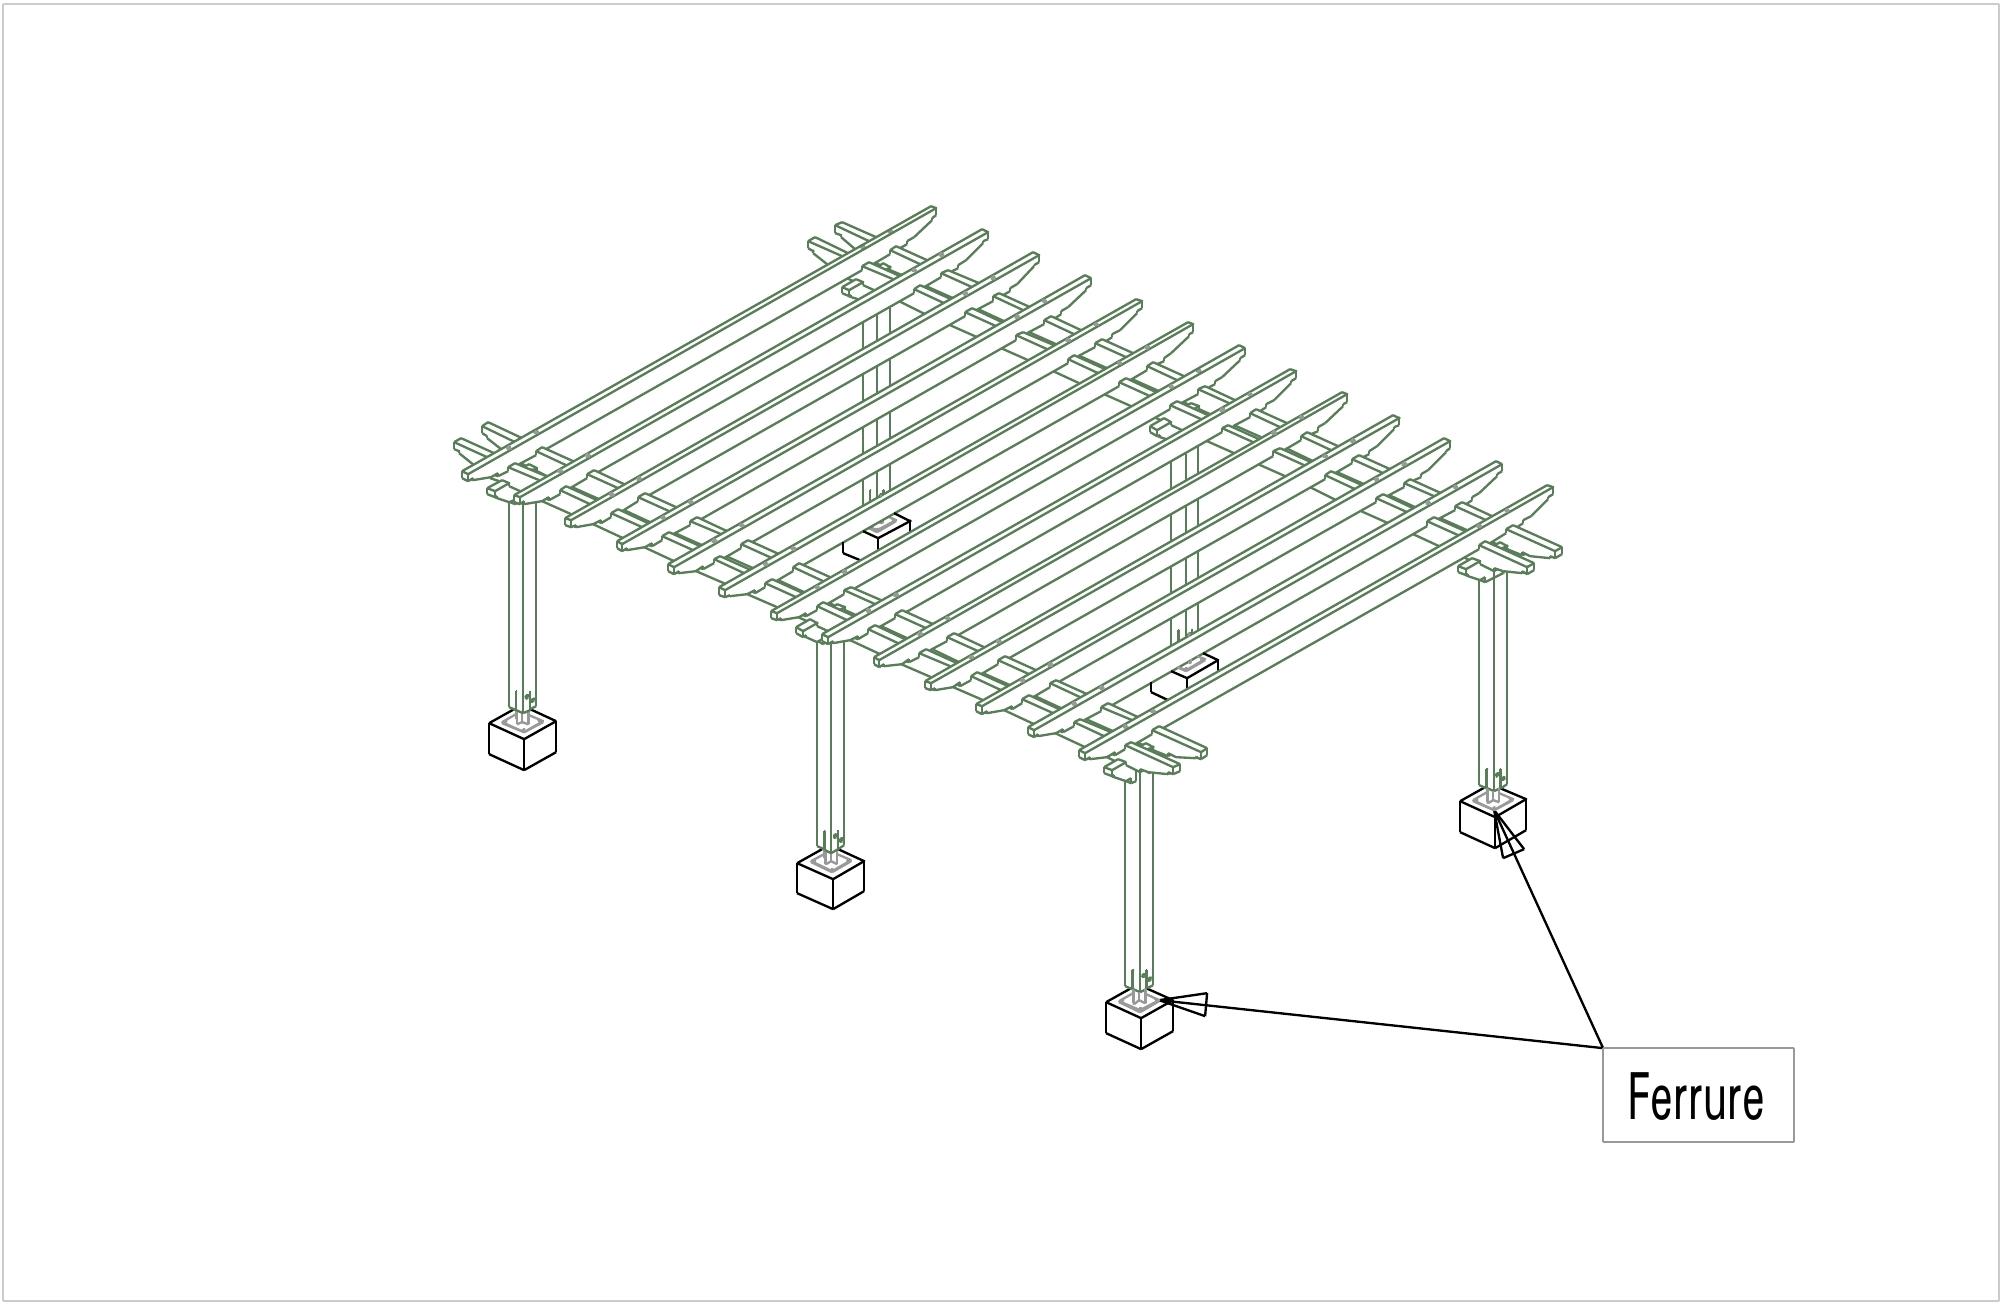 pergola 6 poteaux pergola bois jardin martin charpentes. Black Bedroom Furniture Sets. Home Design Ideas